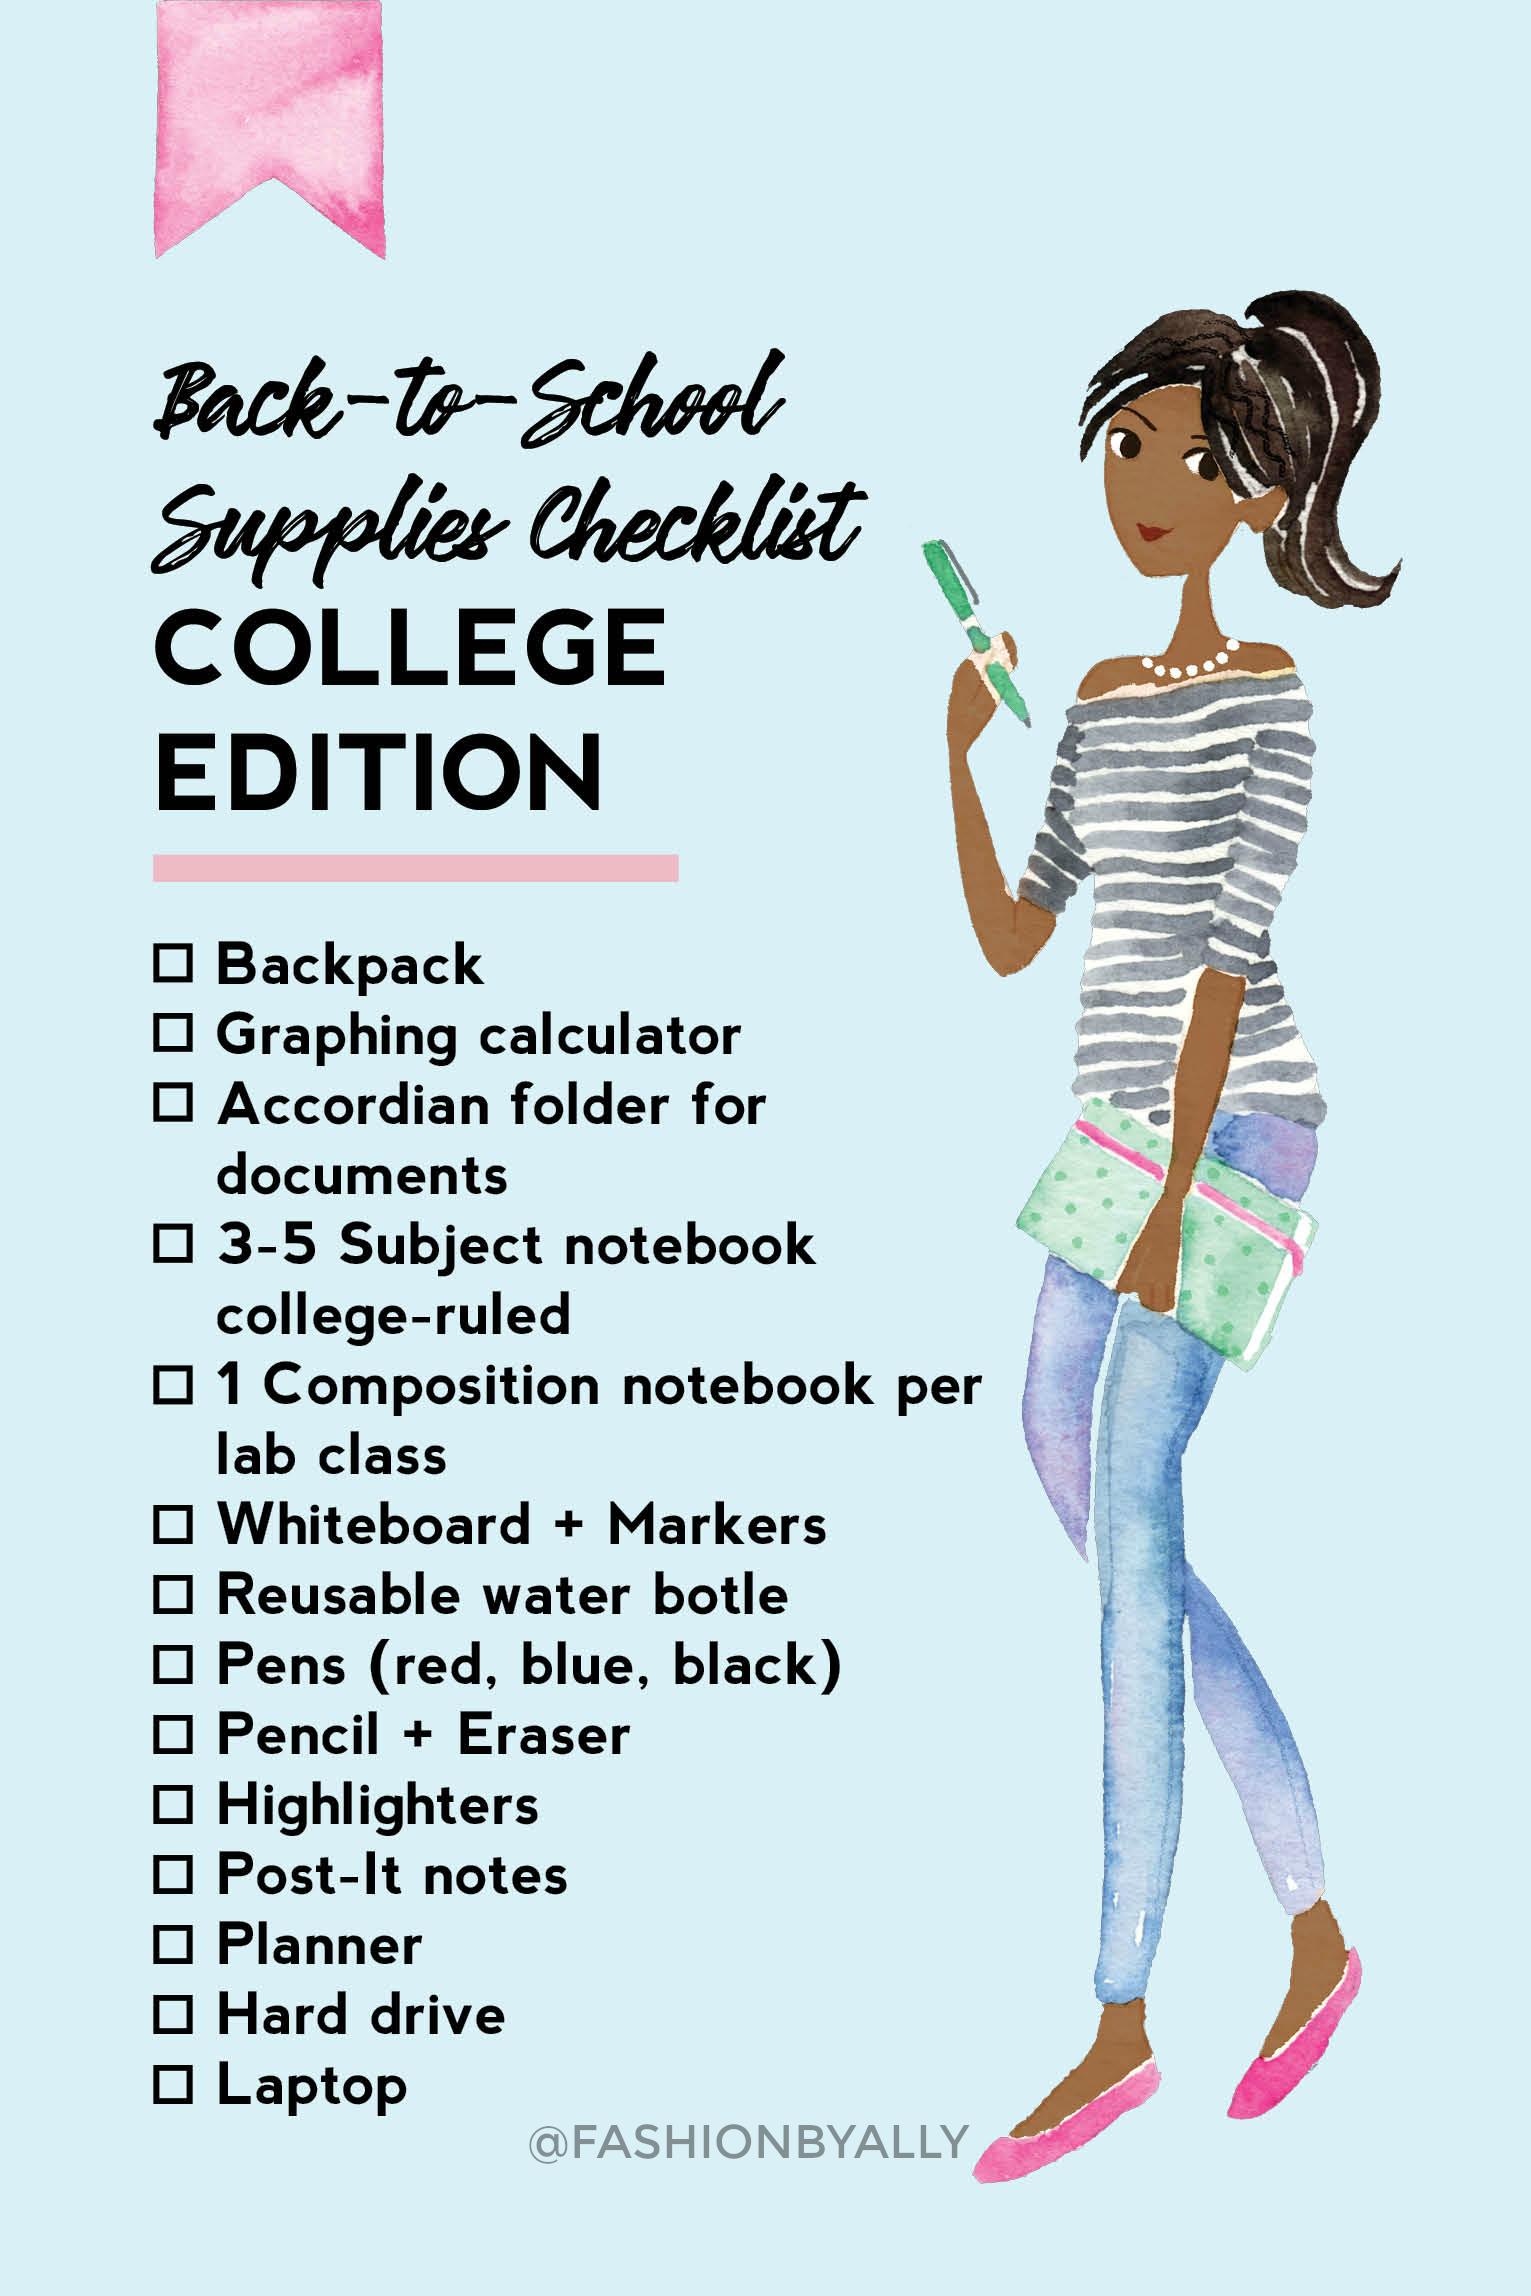 Fashionbyally - Back to School Middle School - Checklists 2.jpg